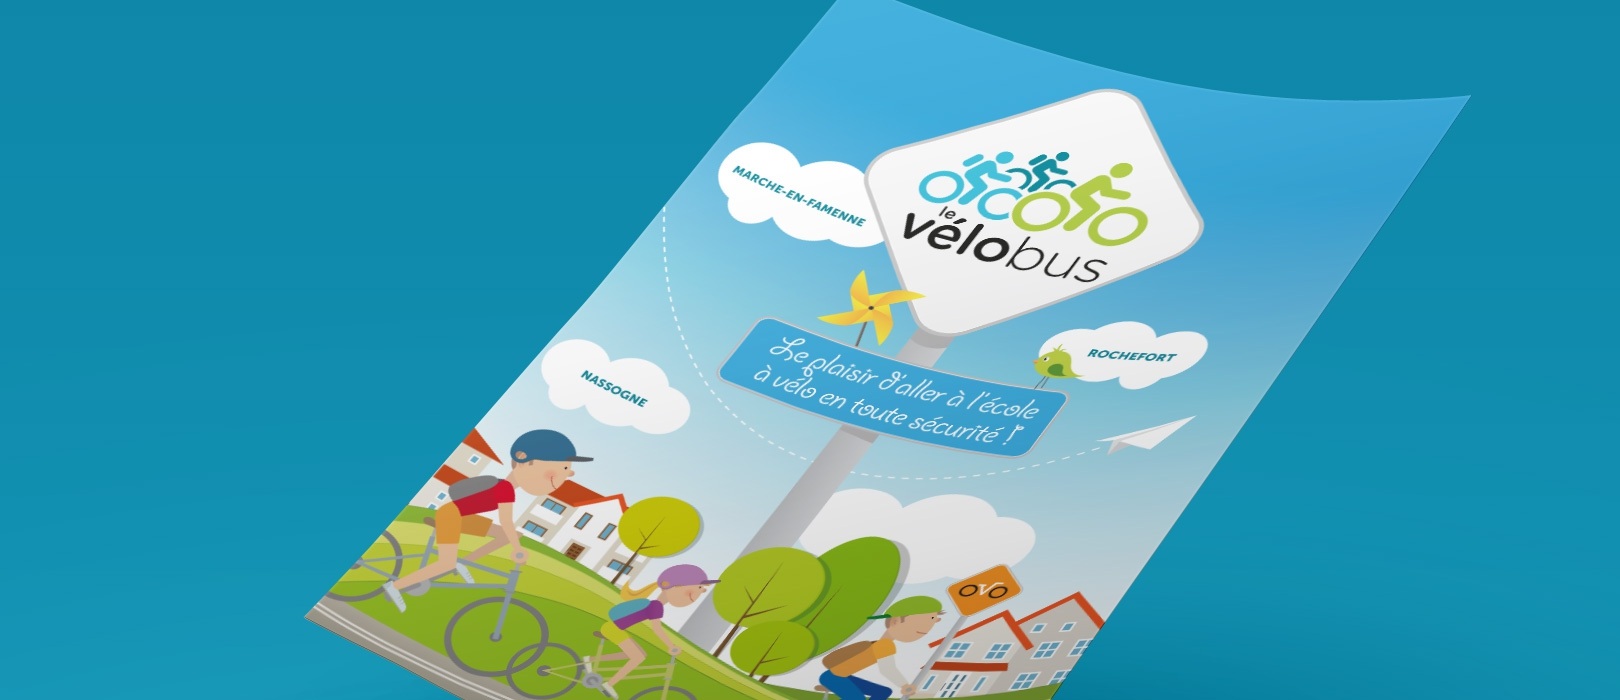 Plan média radio pour promouvoir Fiesta Vélo